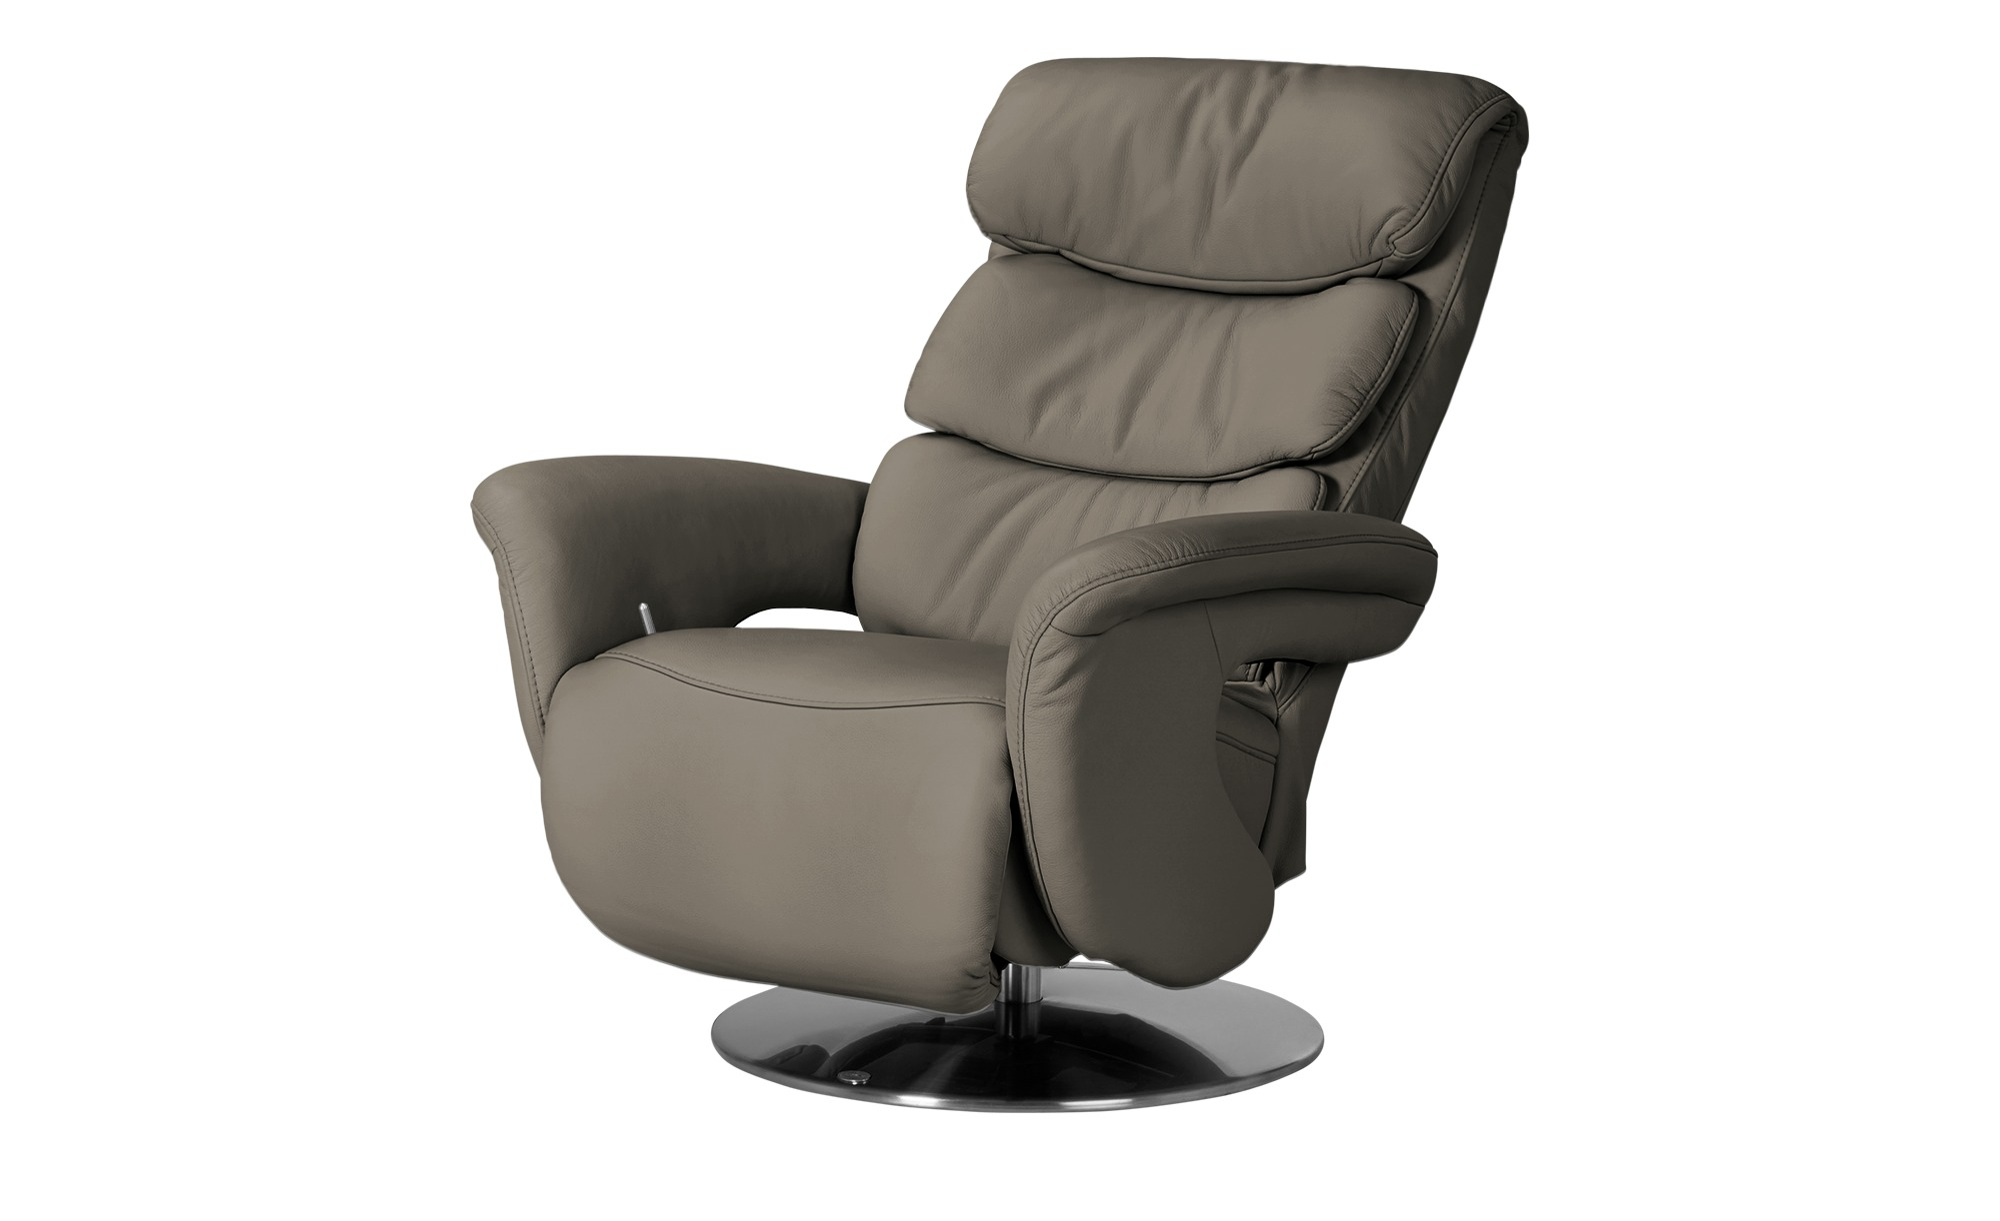 Leder-Relaxsessel beige - Leder Viktoria ¦ beige ¦ Maße (cm): B: 83 H: 107 T: 88 Polstermöbel > Sessel > Fernsehsessel - Höffner